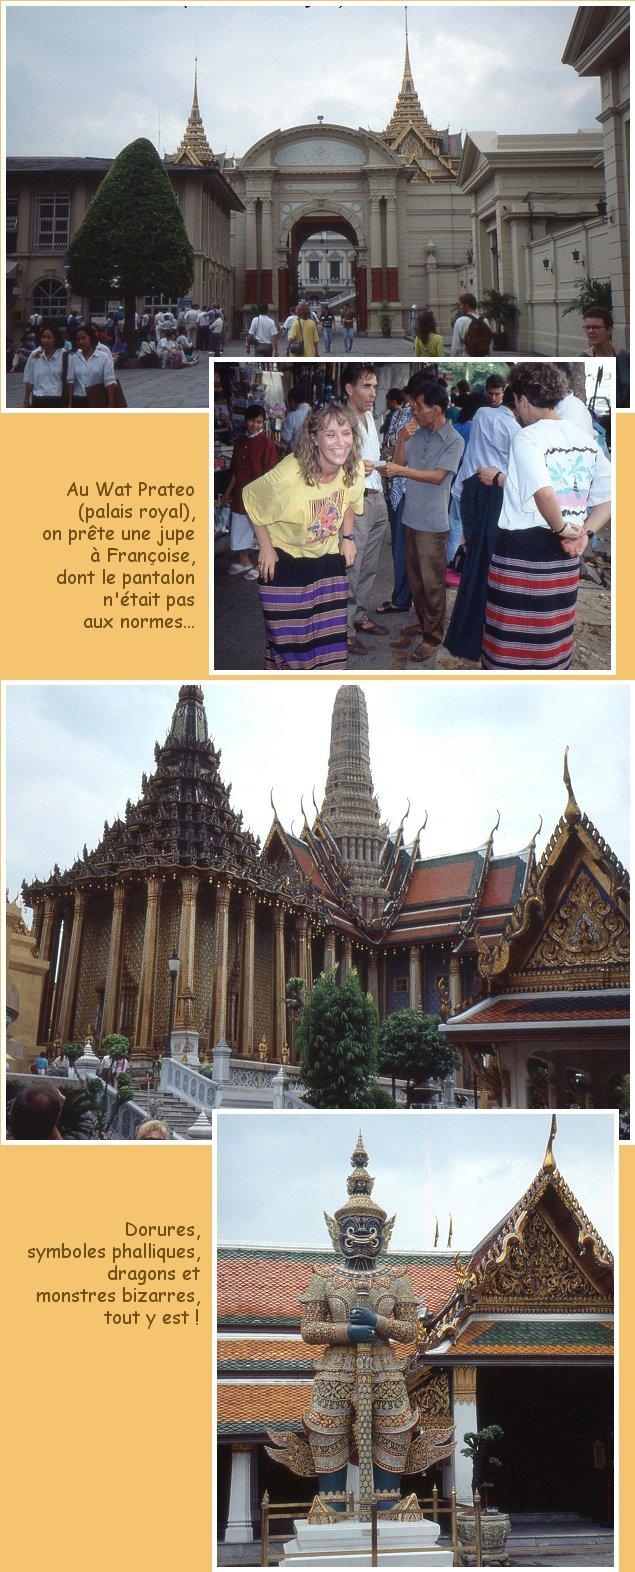 Le Wat Prateo